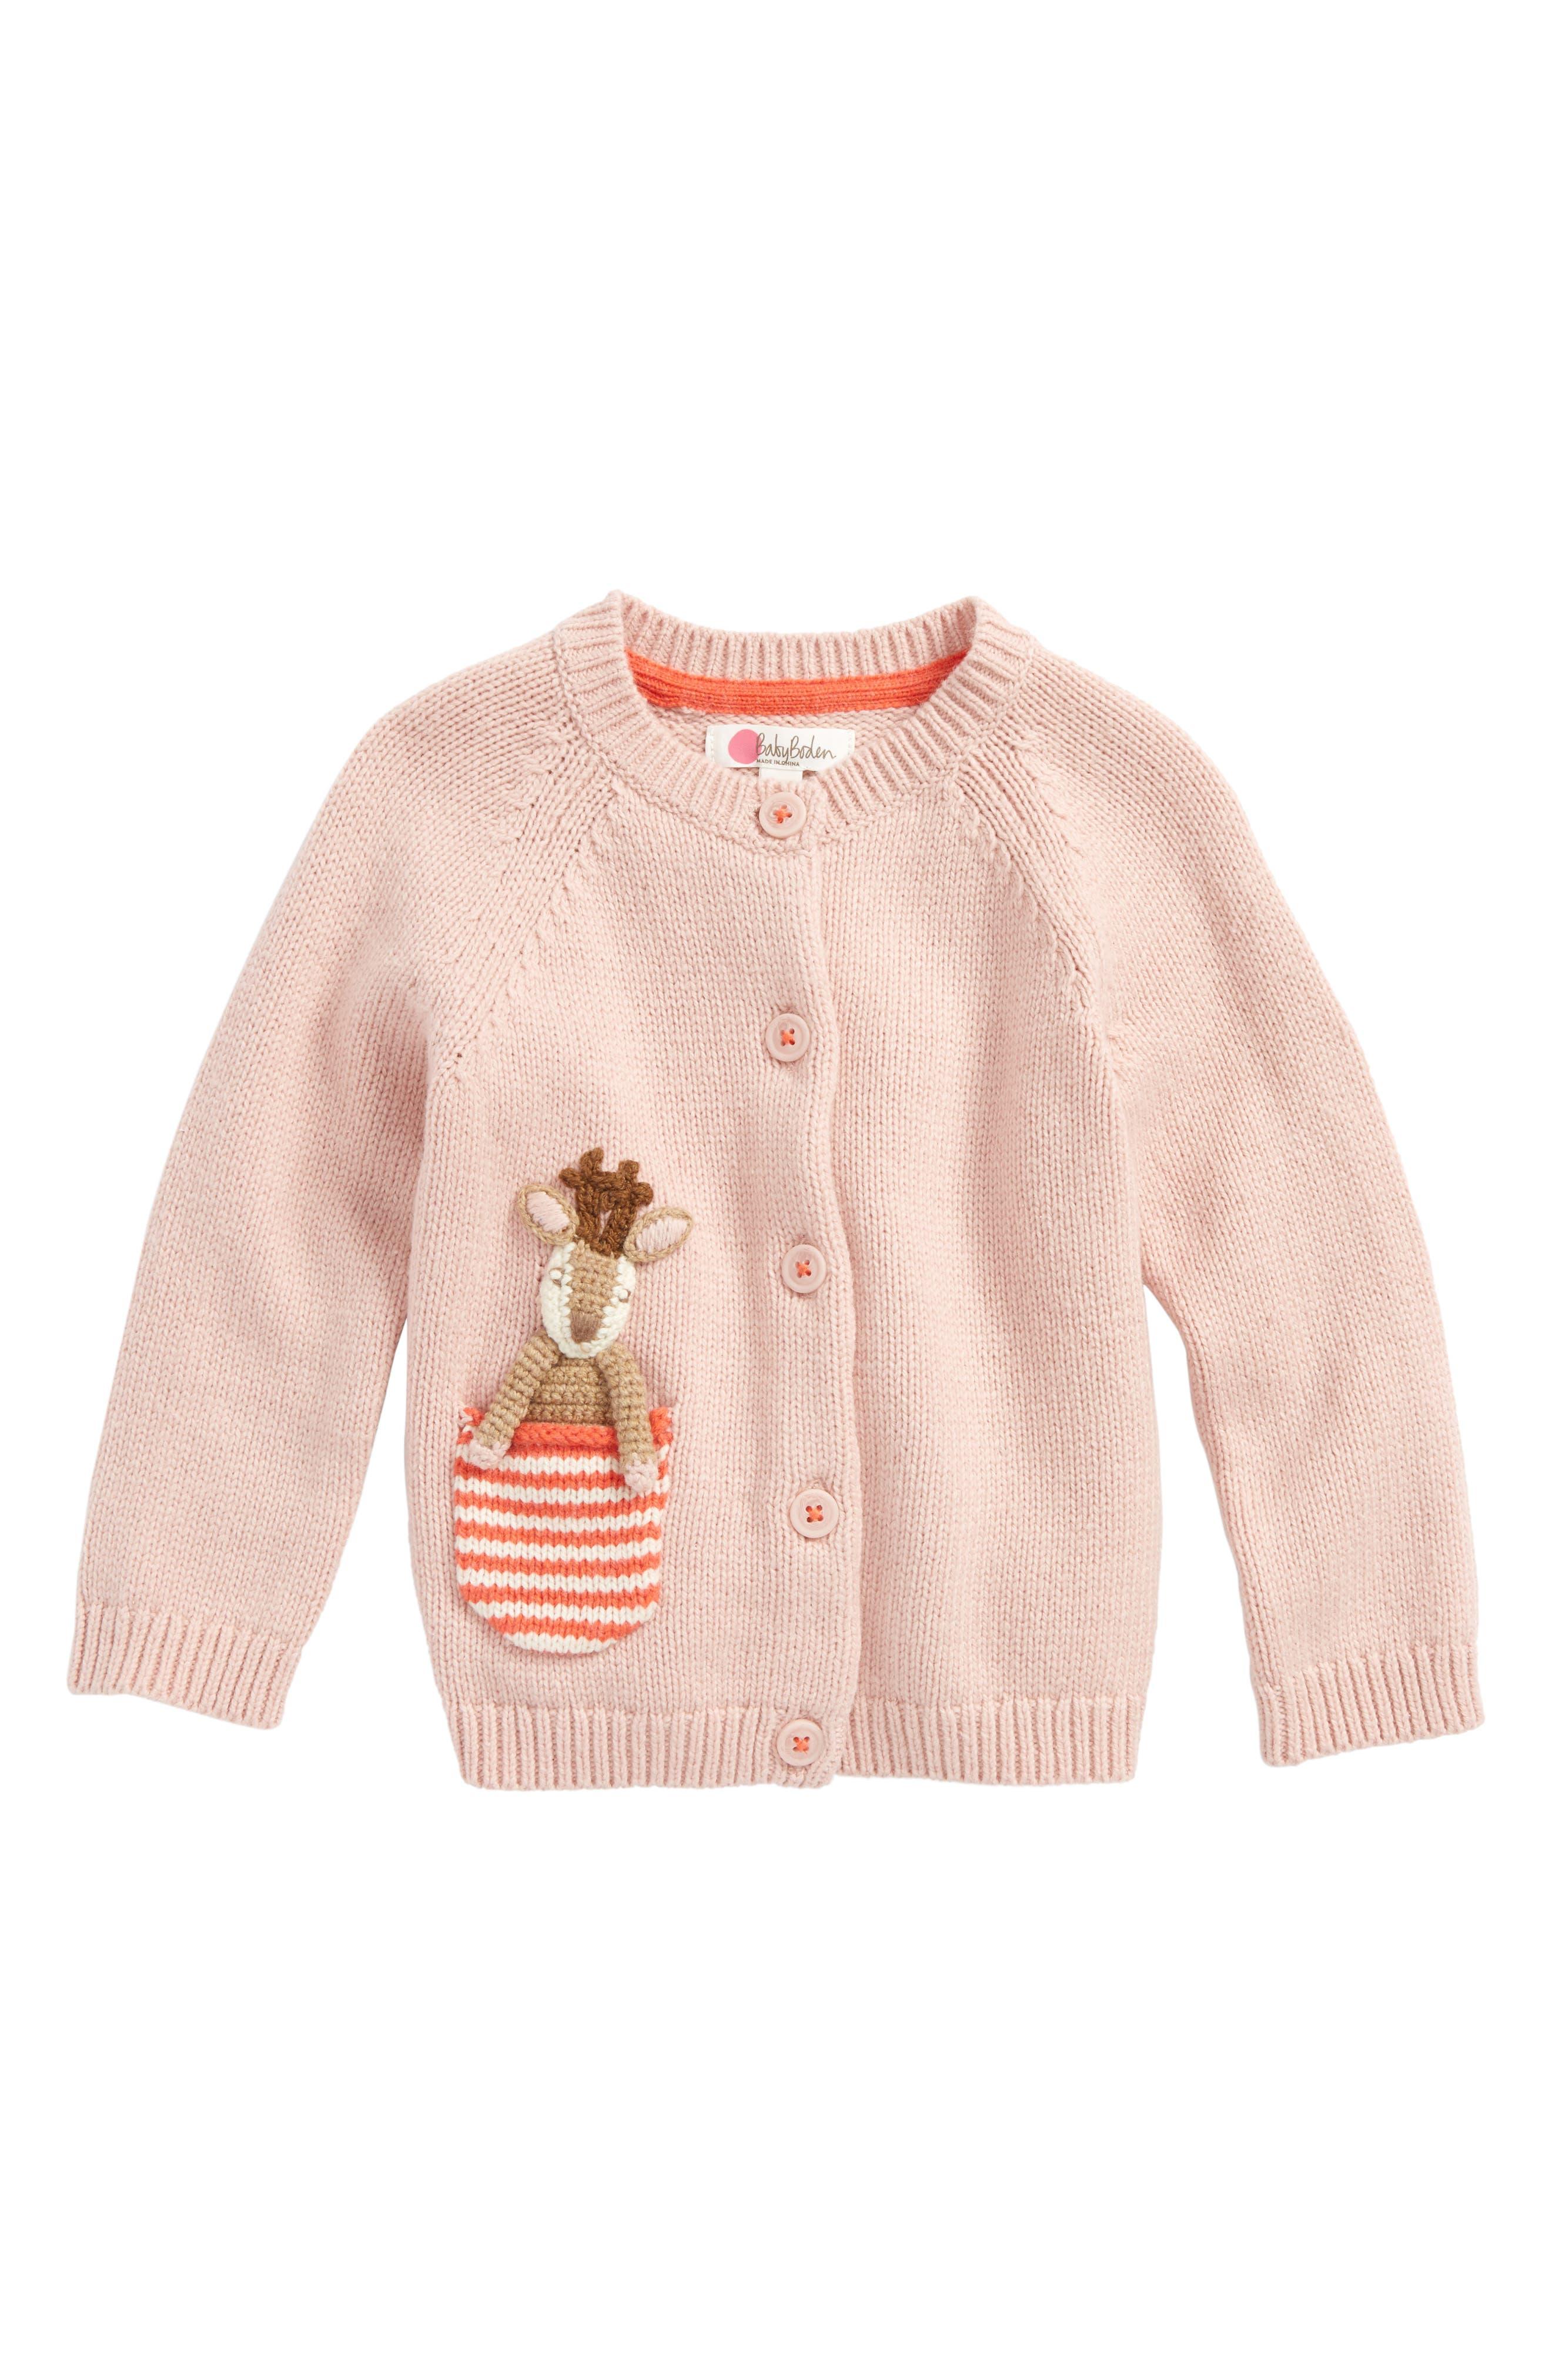 Main Image - Mini Boden Pet-in-a-Pocket Cardigan (Baby Girls & Toddler Girls)